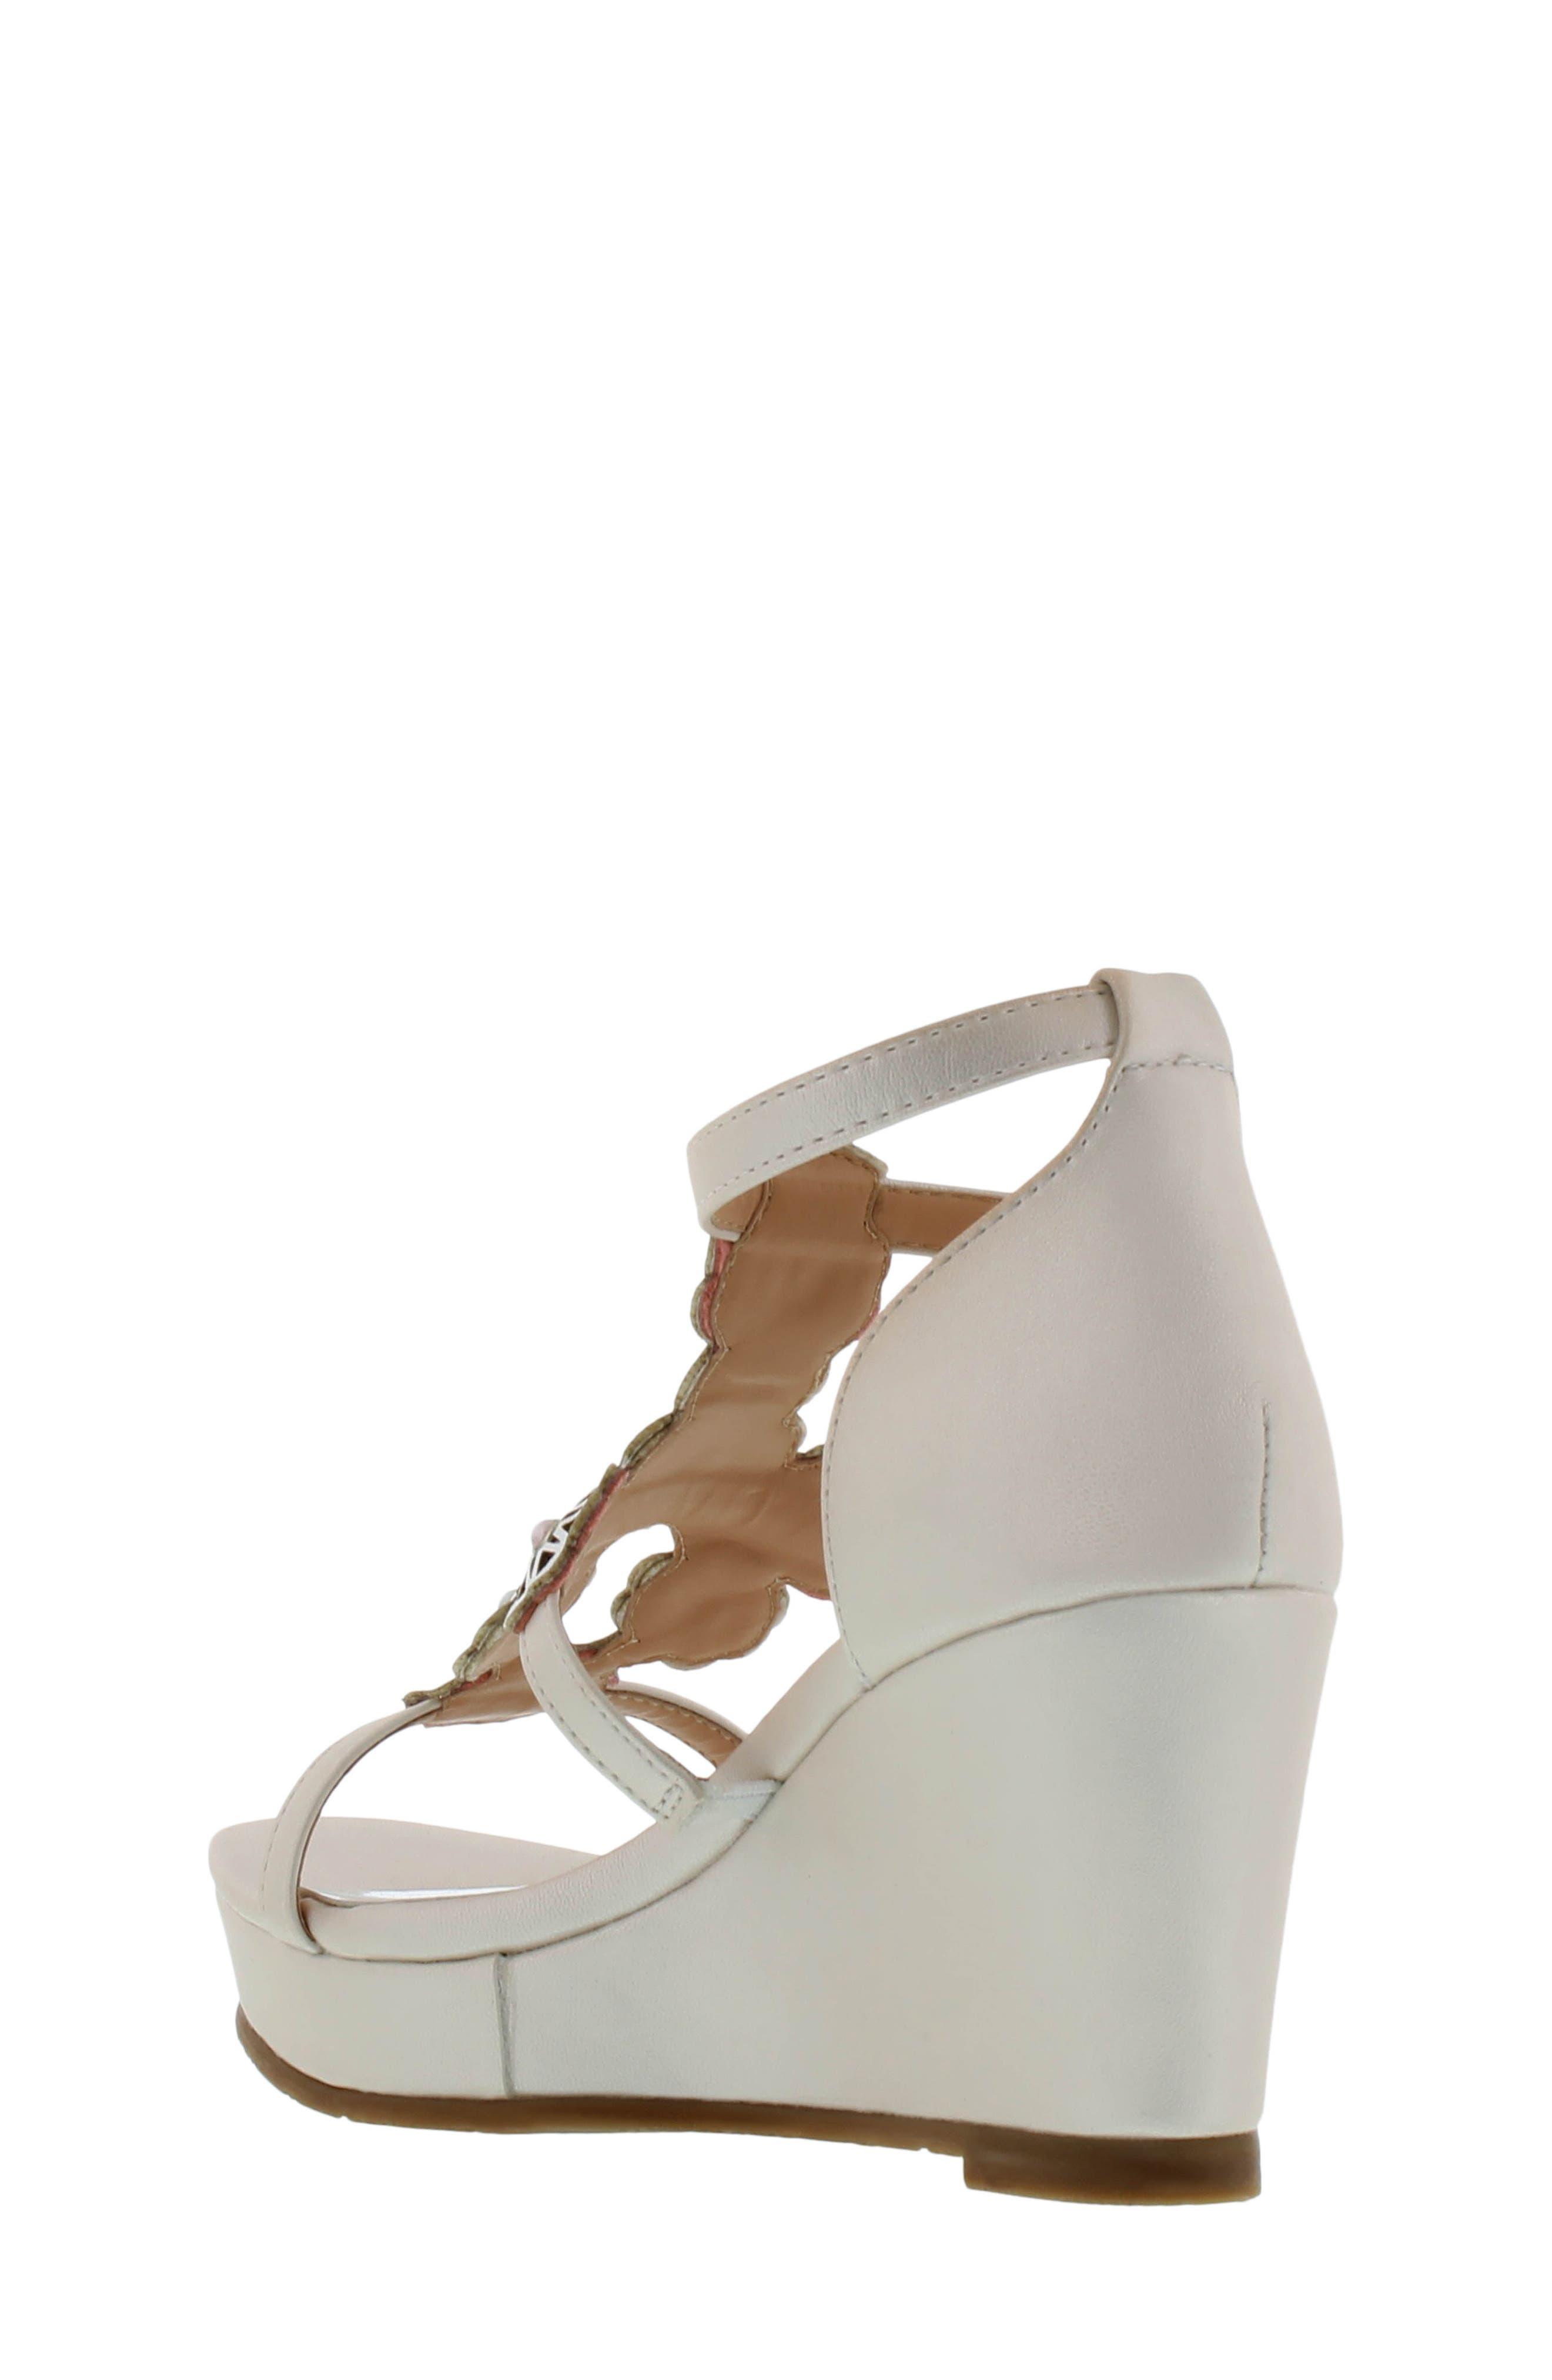 Sophia Flora Wedge Sandal,                             Alternate thumbnail 2, color,                             Pearlized White Multi